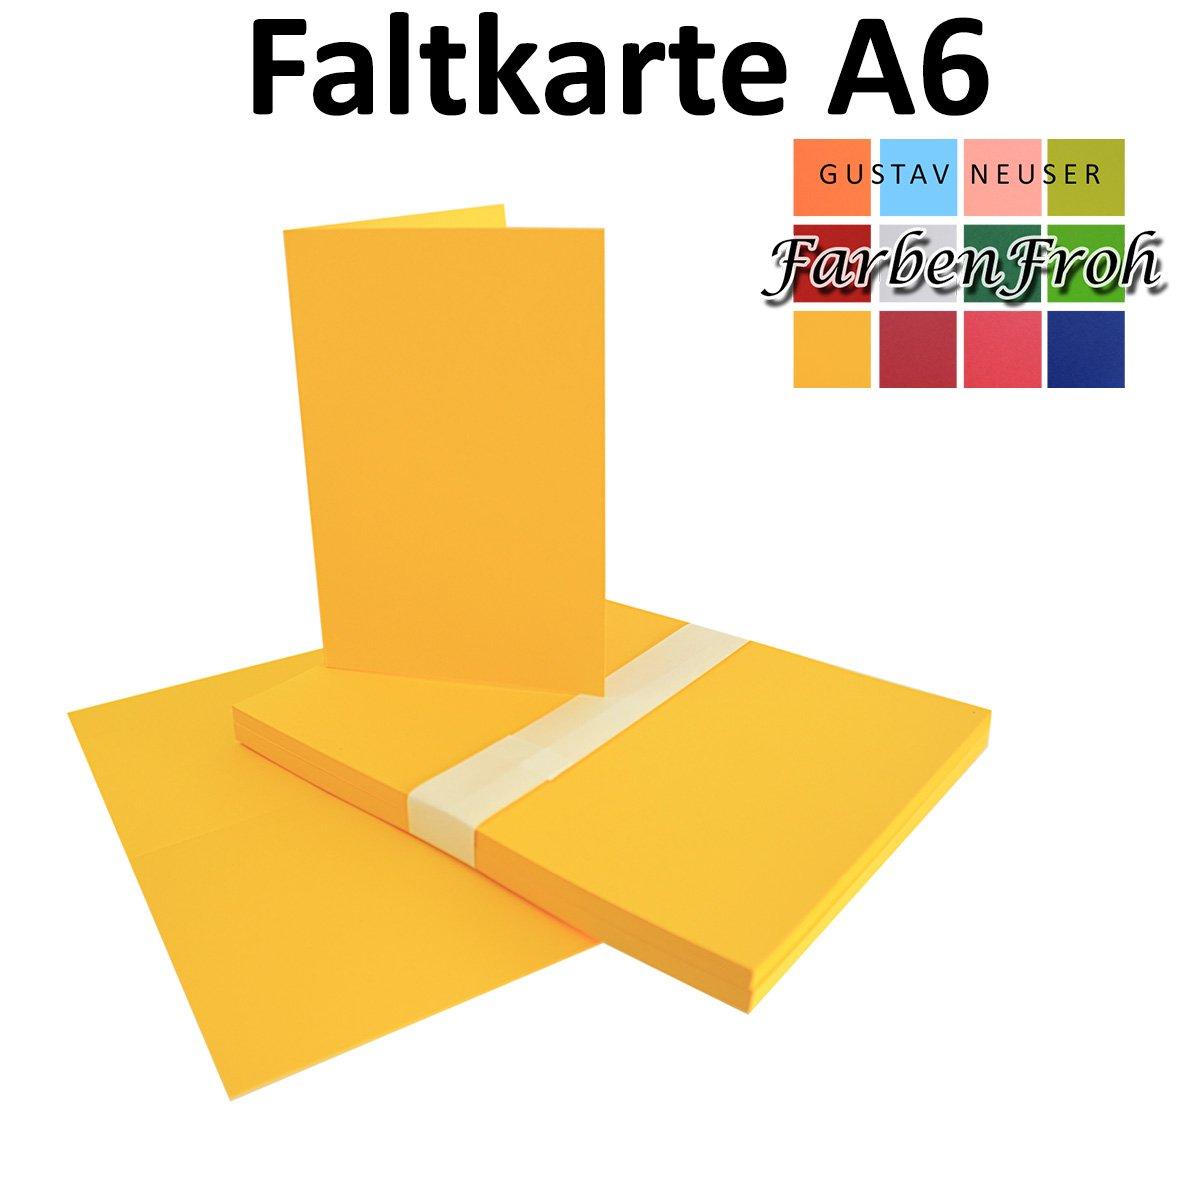 250x Falt-Karten DIN A6 A6 A6 Blanko Doppel-Karten in Hochweiß Kristallweiß -10,5 x 14,8 cm   Premium Qualität   FarbenFroh® B078TGZYPQ Kartenkartons Sonderpreis 3e1d16